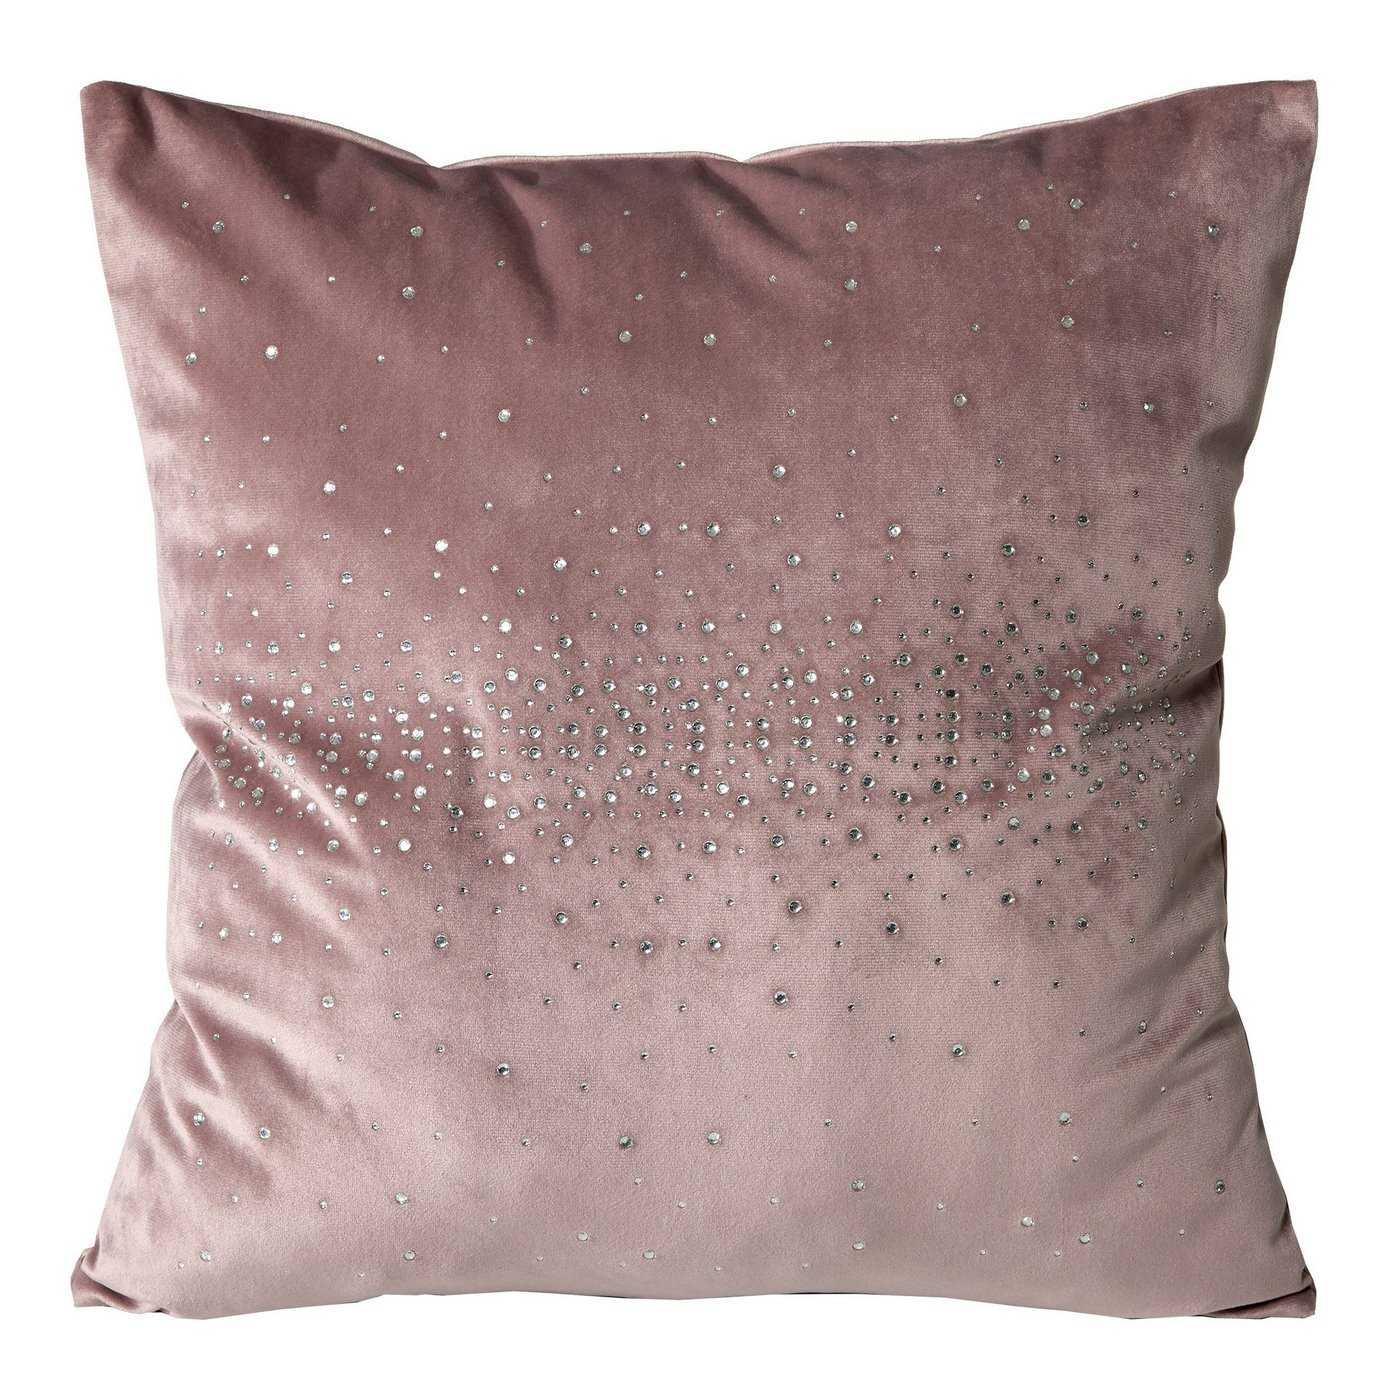 Rożowa POSZEWKA OZDOBNA Kasandra velvet z kryształami 45x45 cm